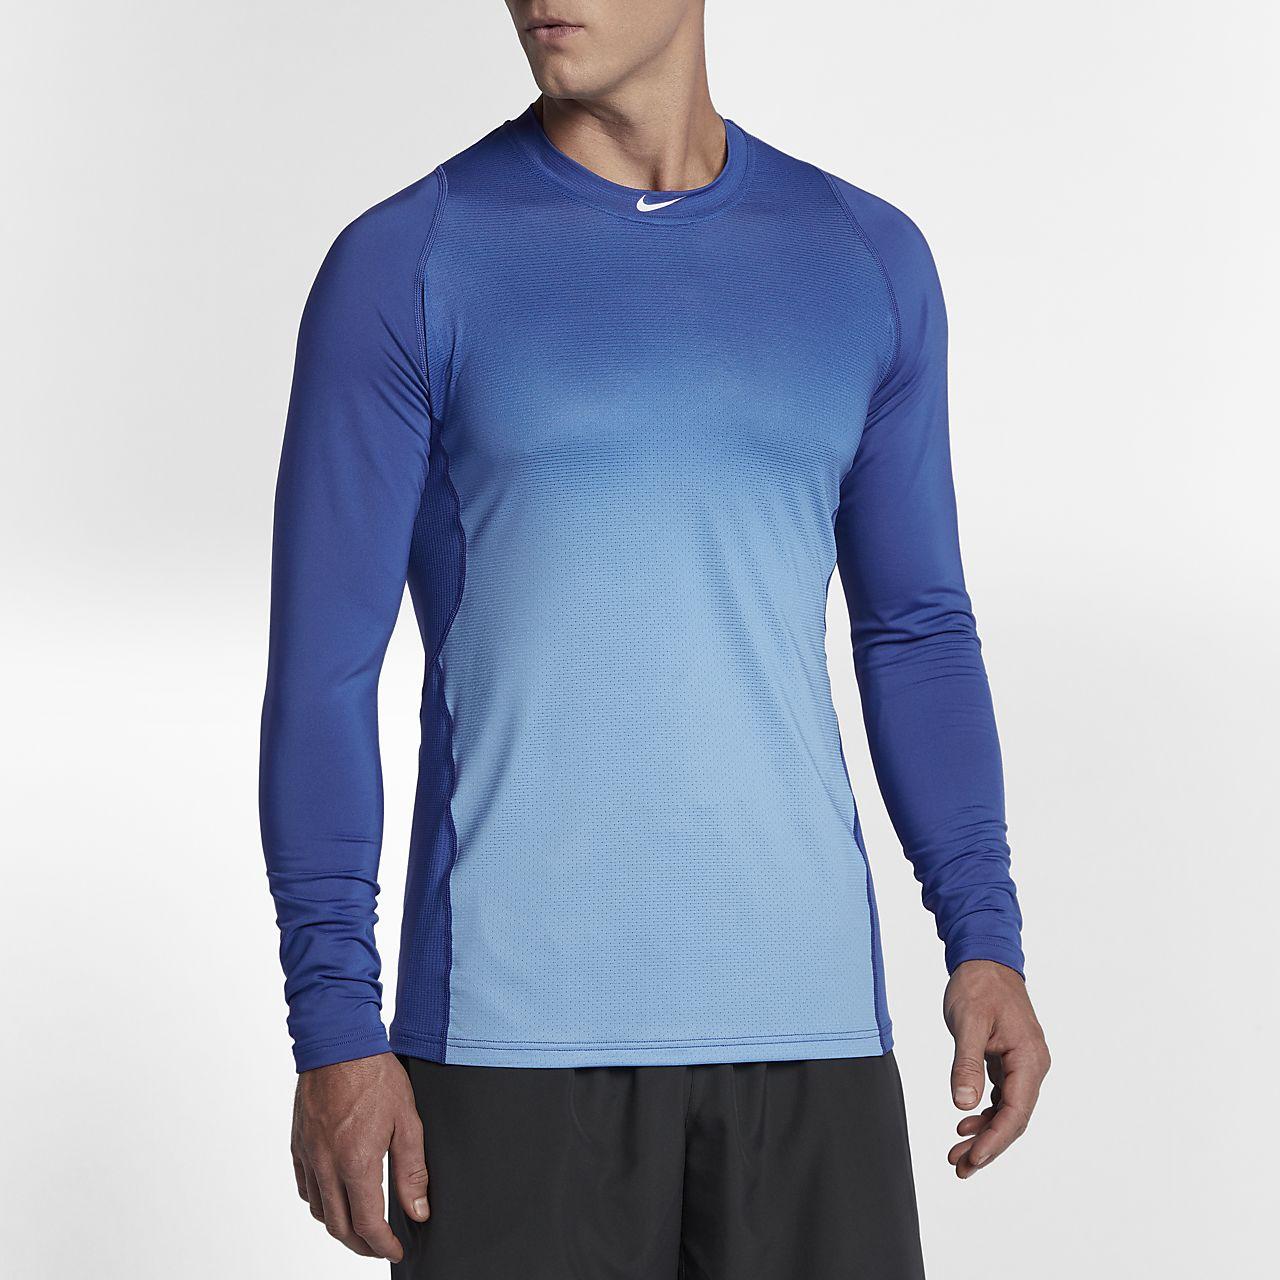 ... Nike Pro HyperCool Men's Long Sleeve Baseball Top